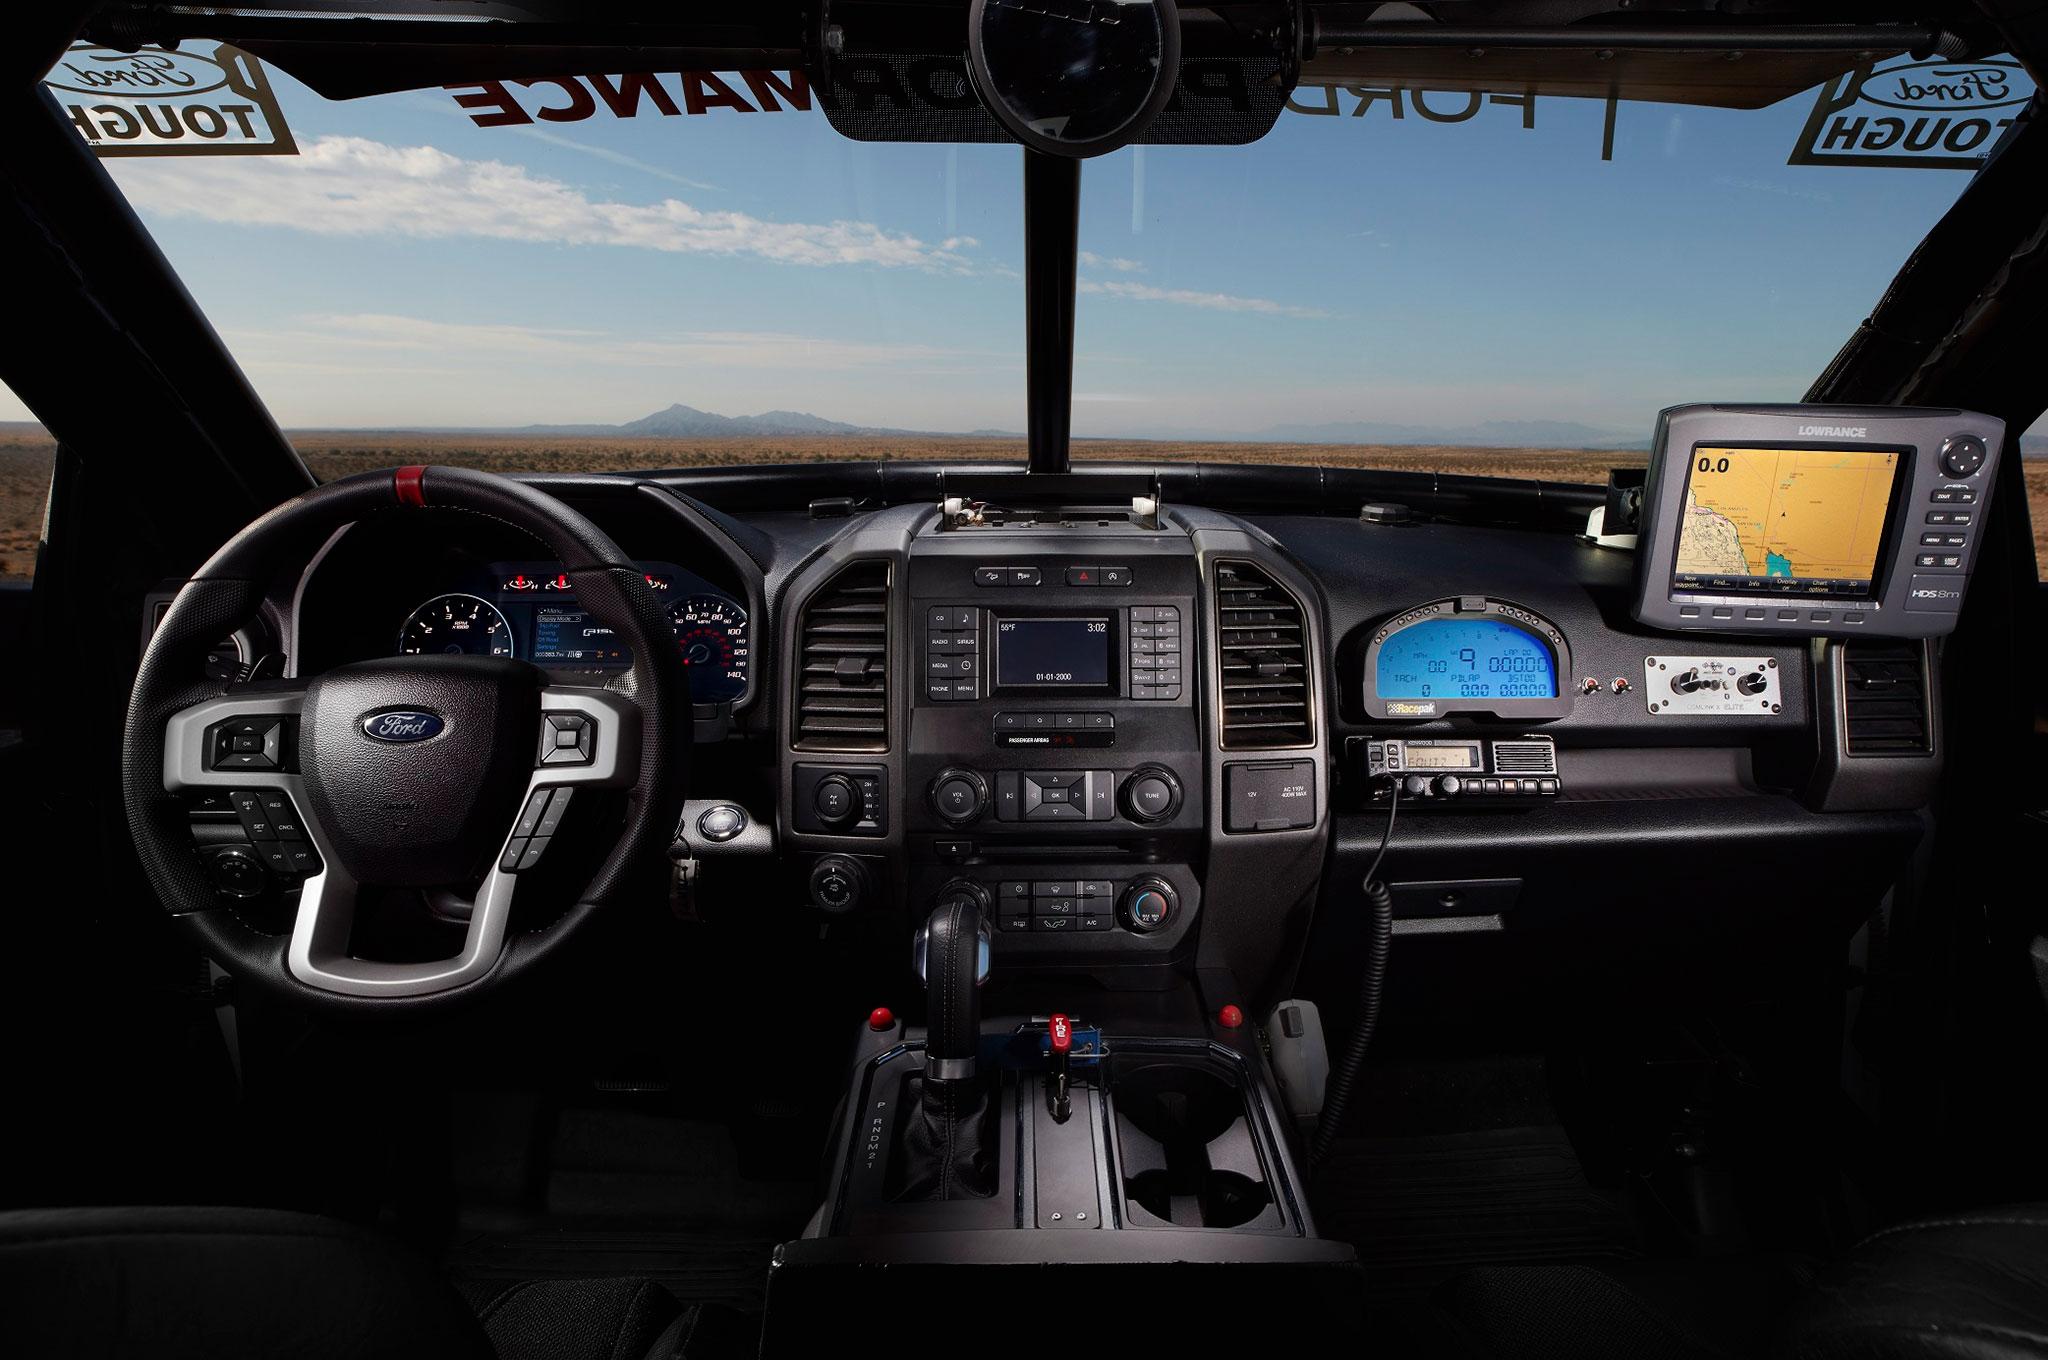 First Drive 2017 Ford F 150 Raptor Automobile Magazine Circuit Board Pickup Truck Bronco Interior Dash Instrument Show More